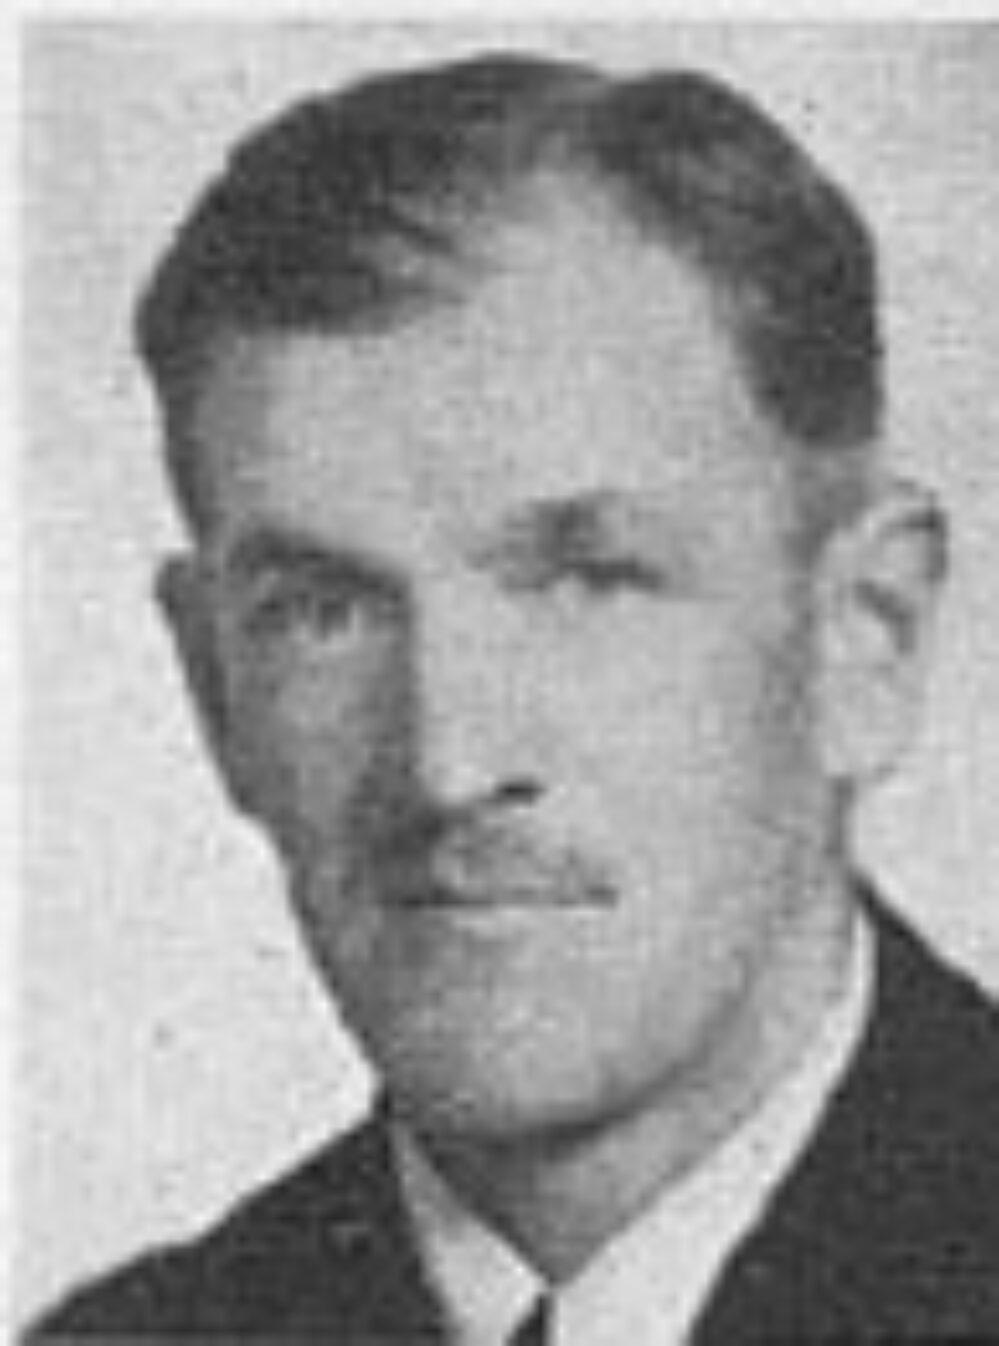 Johan Fritjof Larsen